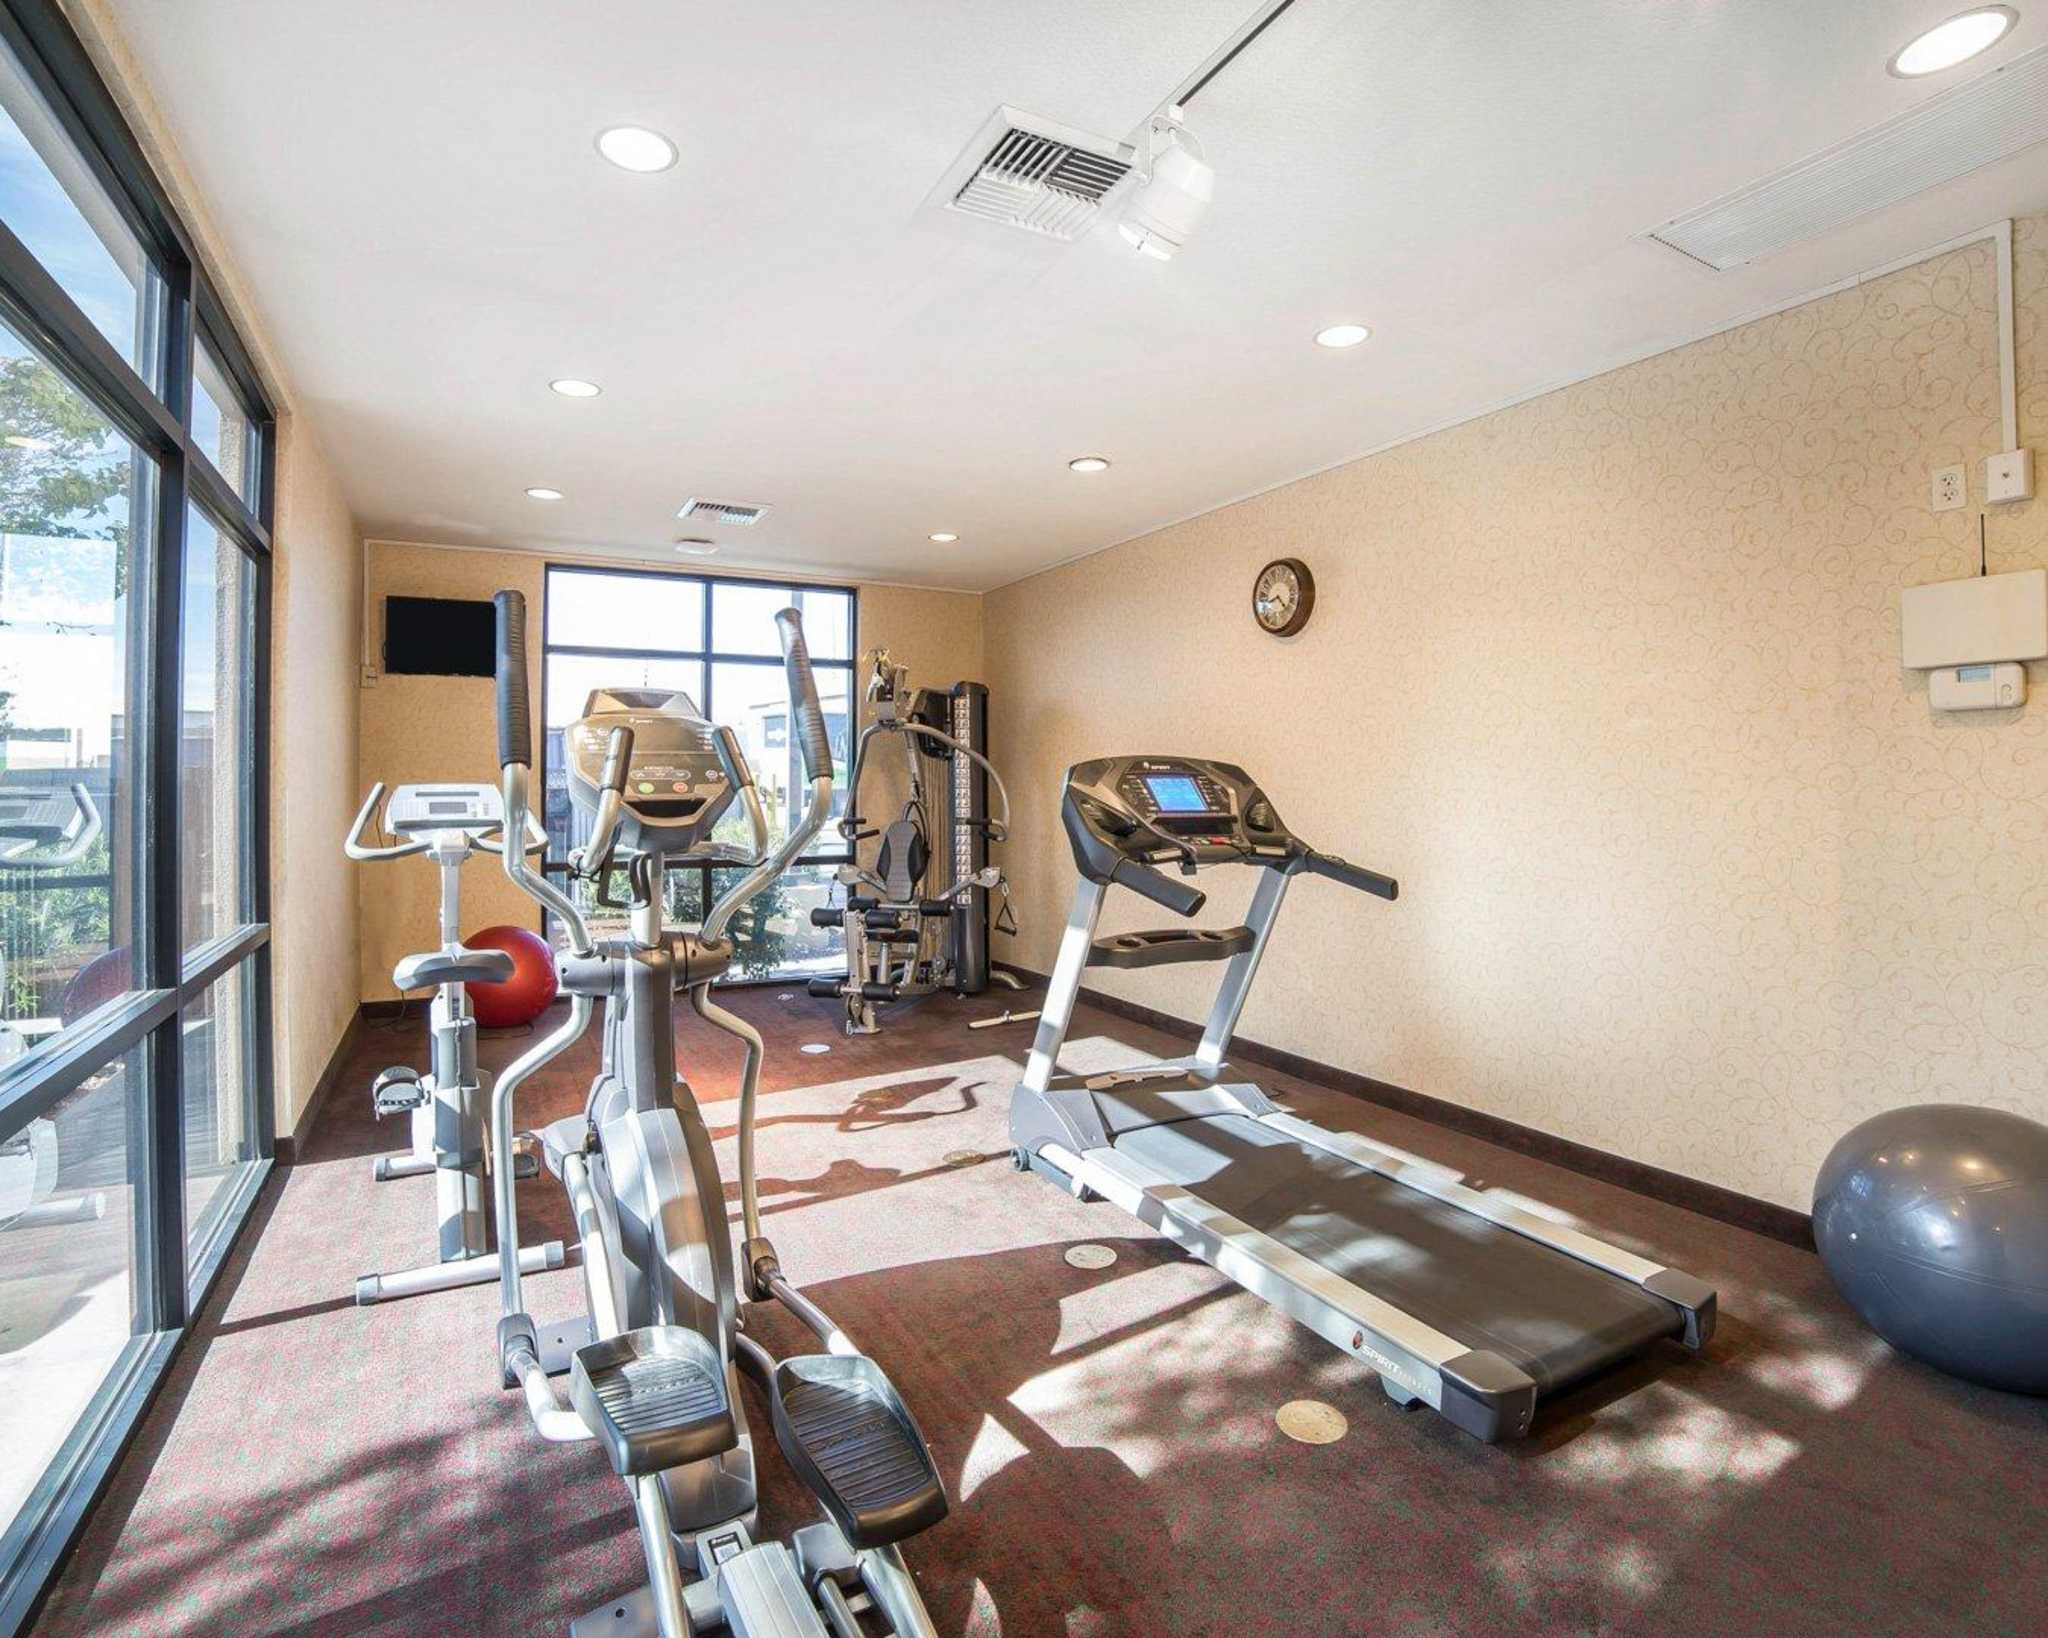 Comfort Inn & Suites Las Vegas - Nellis image 25